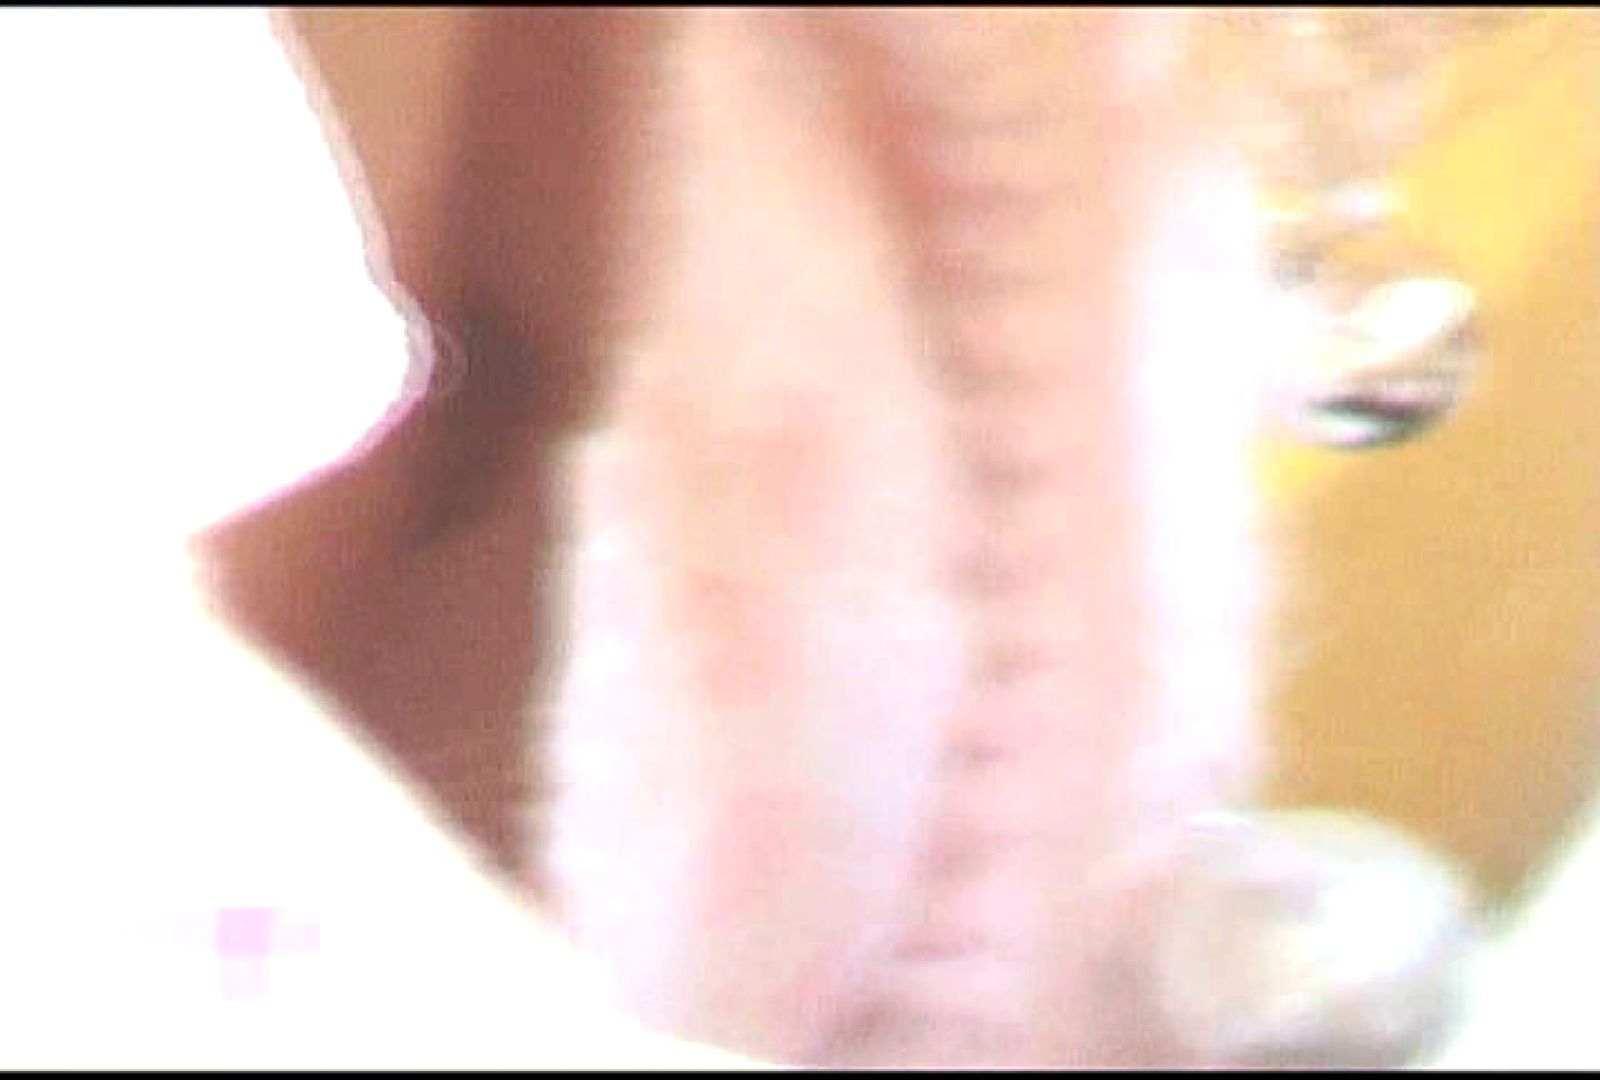 熱視線Vol.5 OLの実態 | 乳首  49pic 7